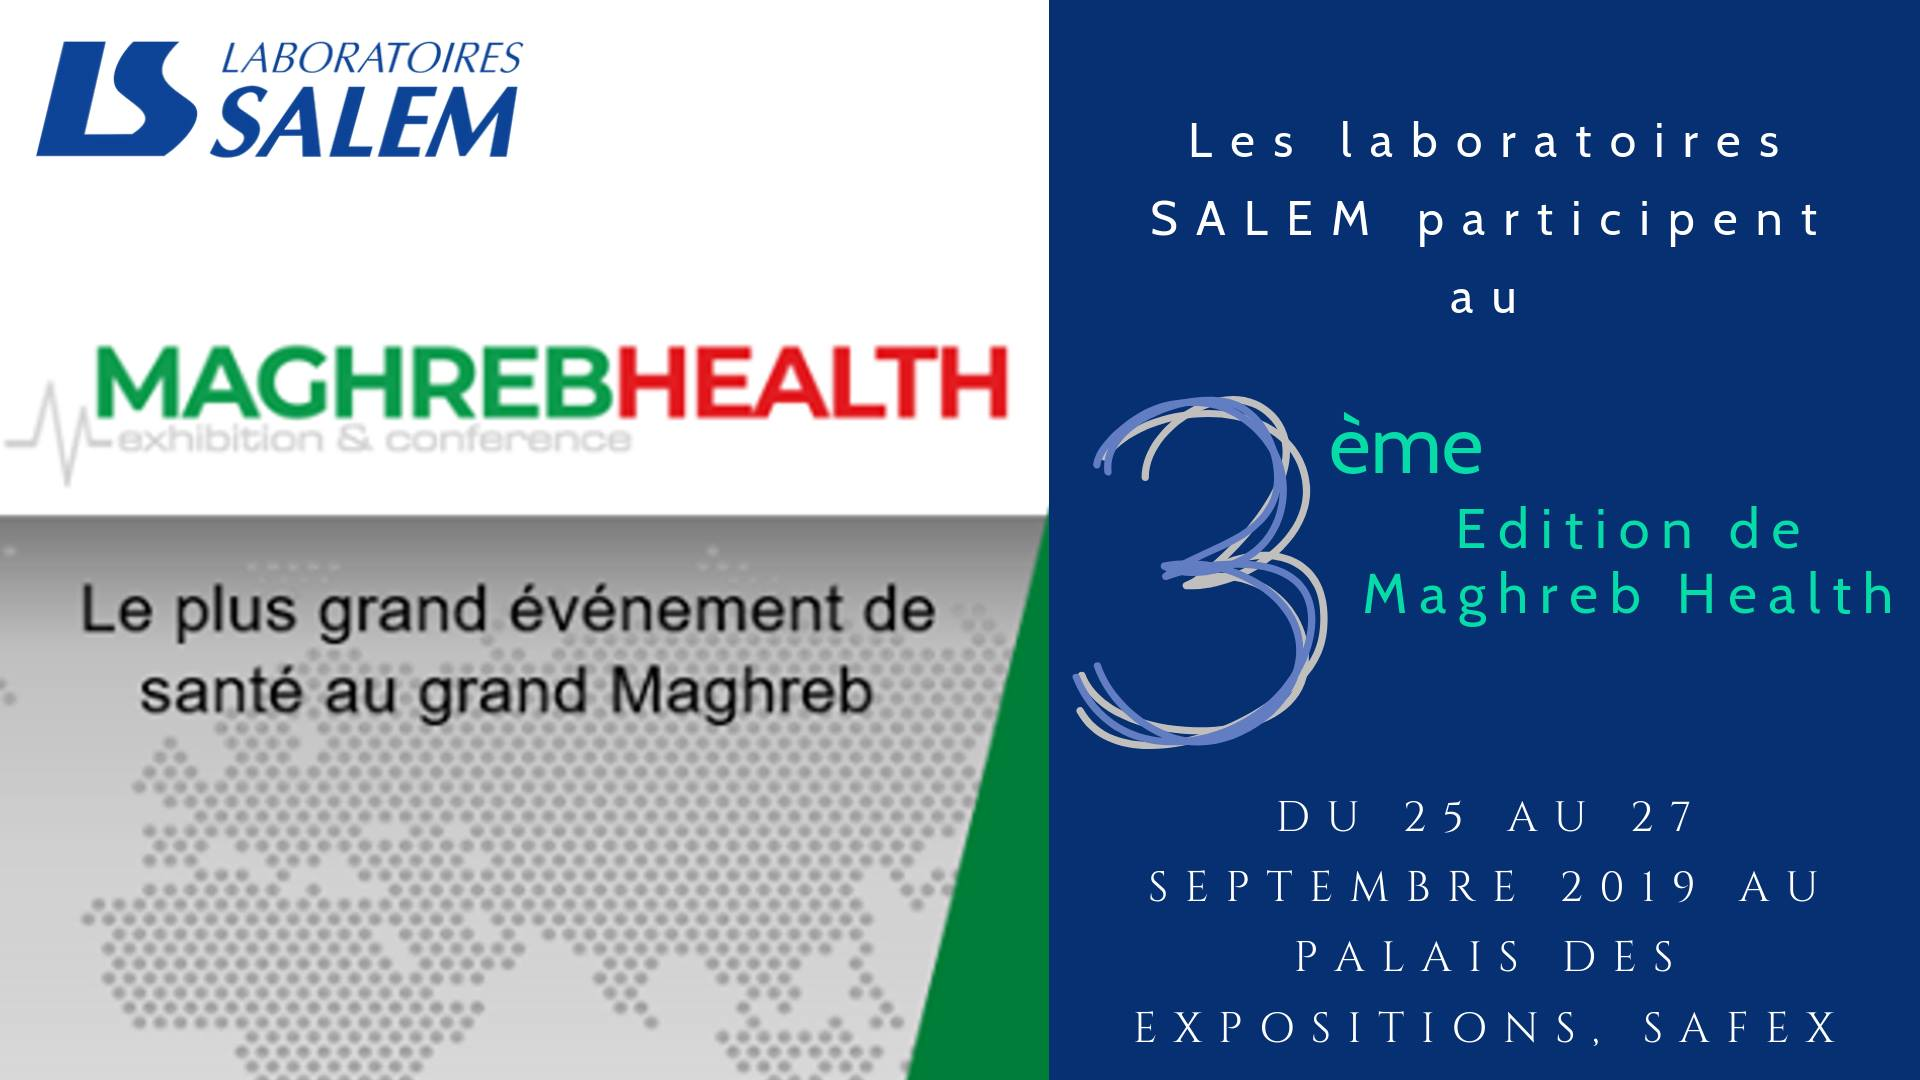 pharma, labosalem, laboratoires salem, maghreb health, healtj